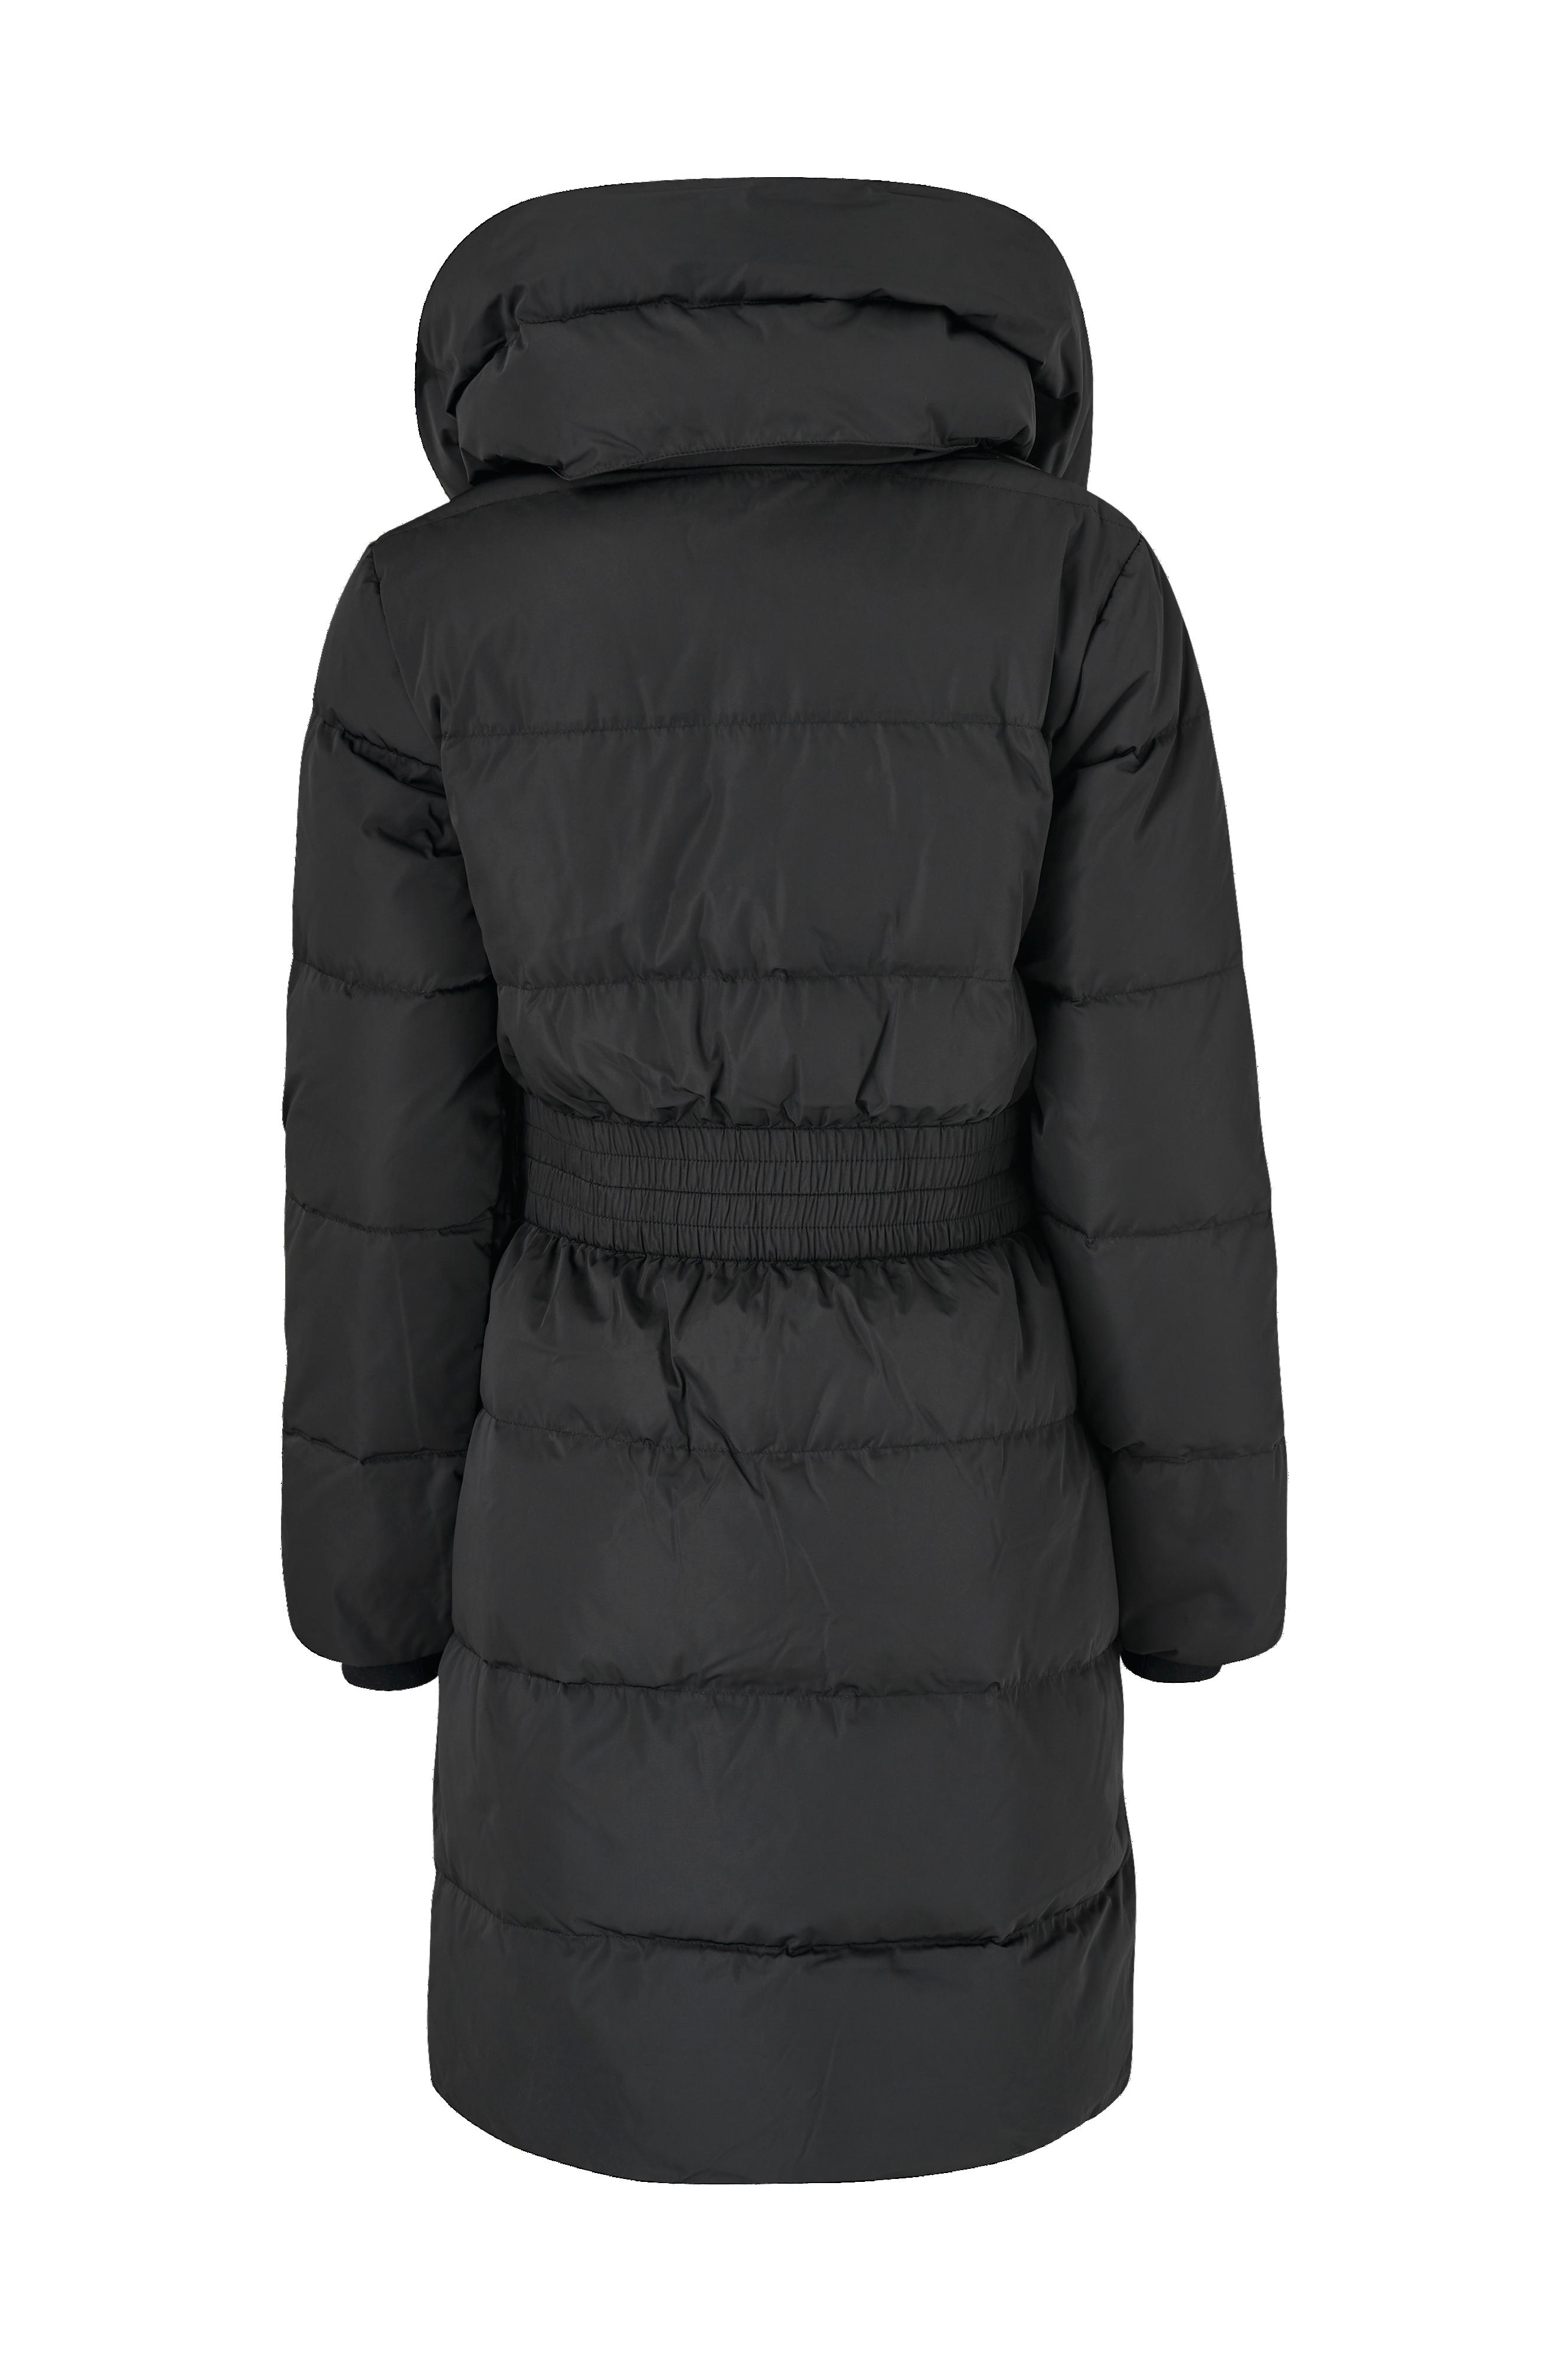 Dunfrakke Mala Puff Coat Long